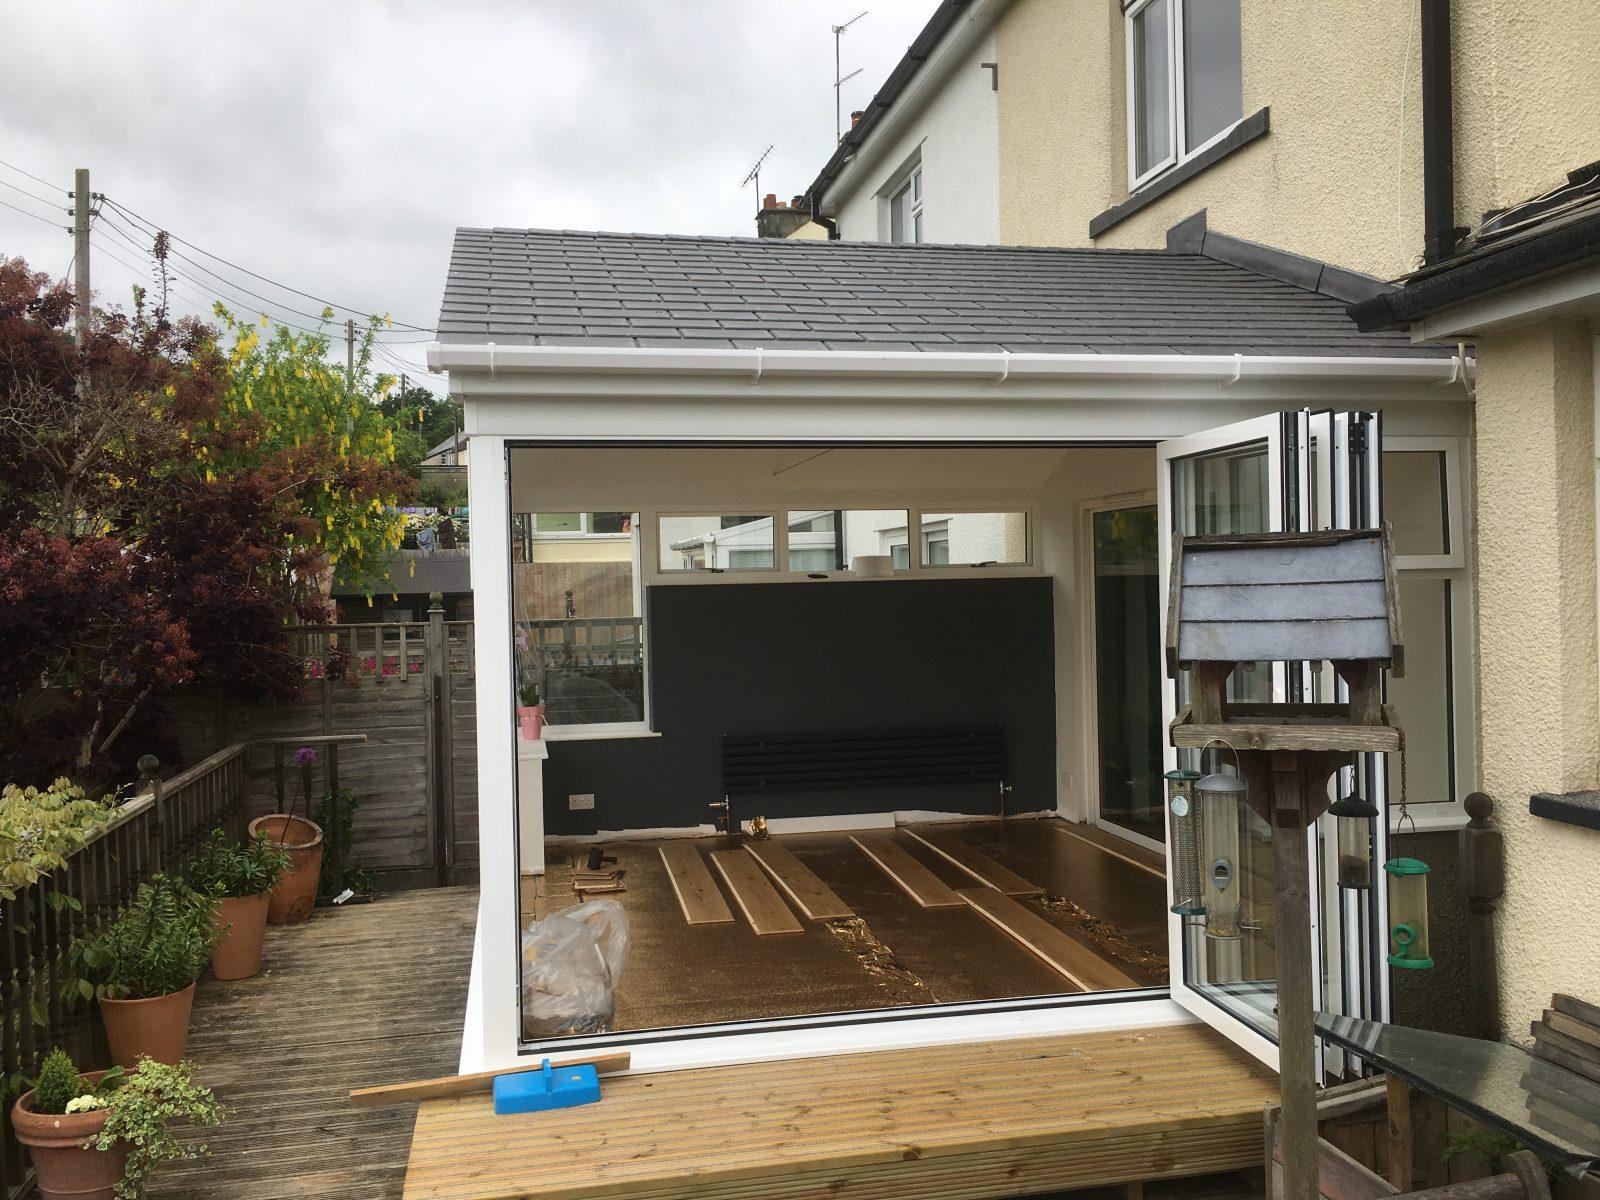 Hewlett case study, aluminium conservatory with SupaLite roof